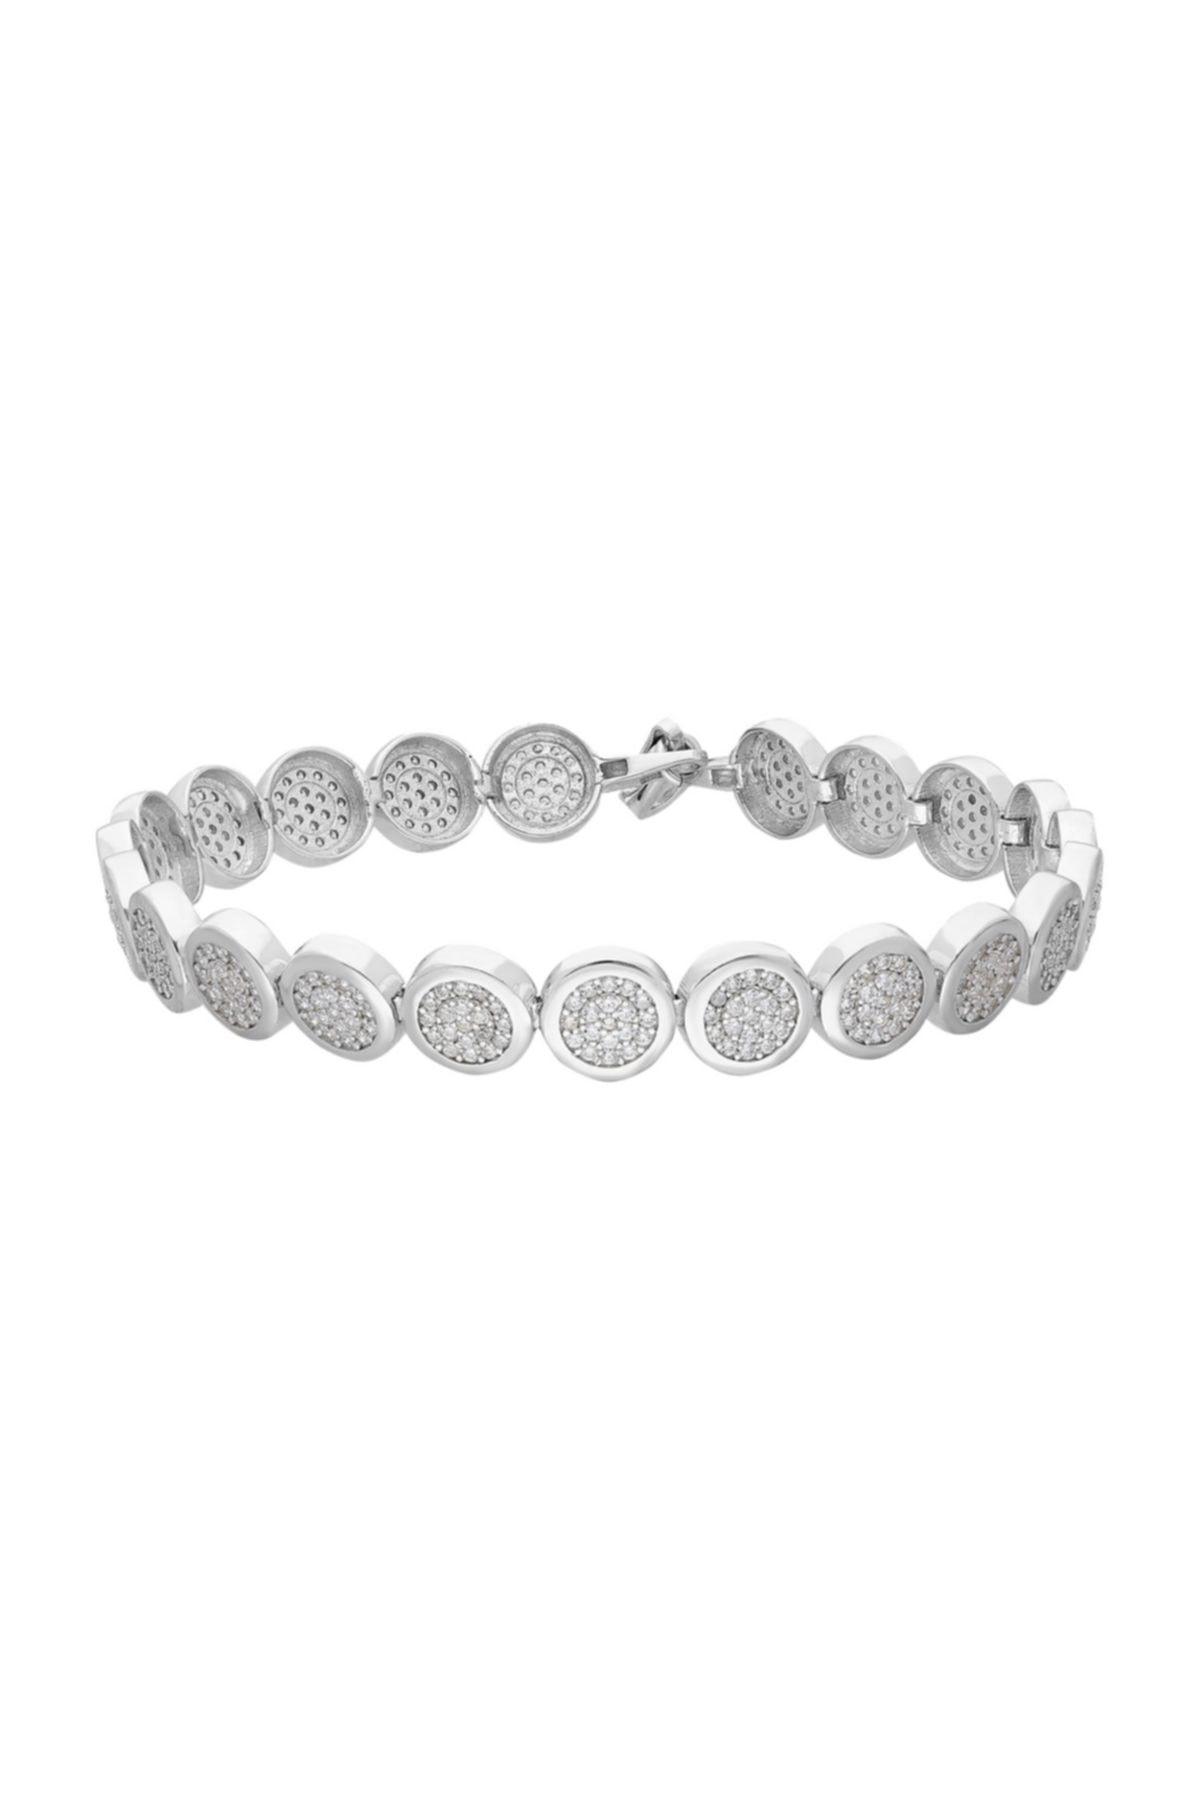 Chavin Su Yolu Yuvarlak Pırlanta Montür Taşlı Gümüş Bileklik Ee41 1